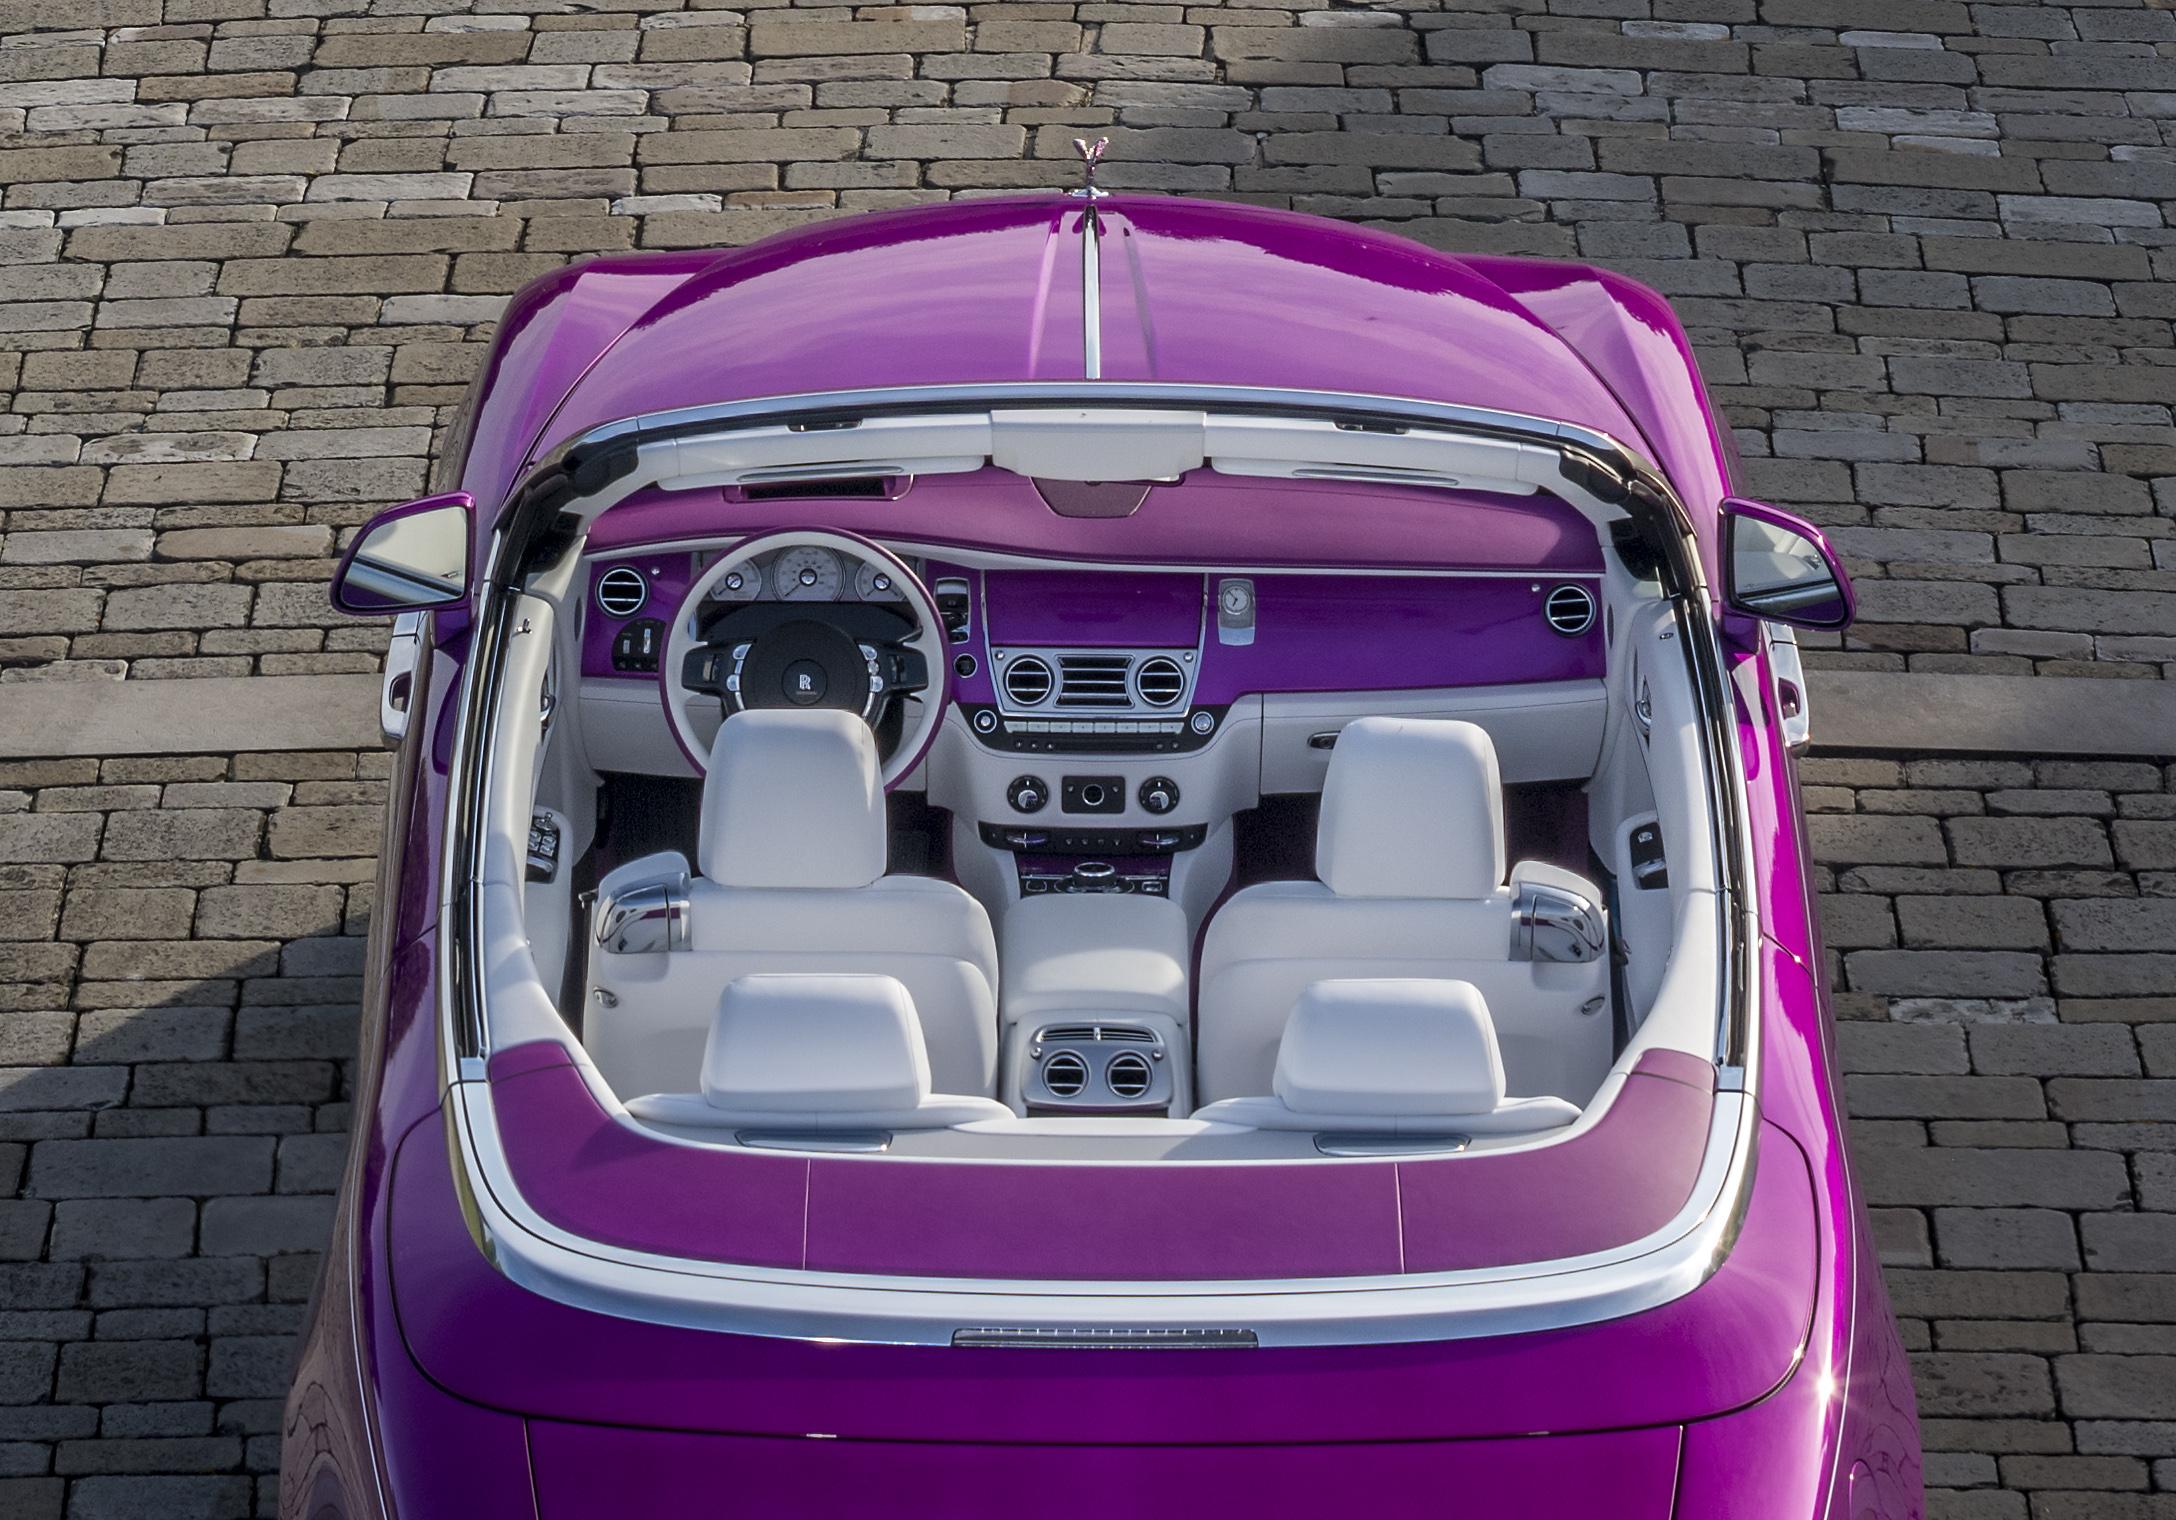 Michael Fux's Rolls-Royce Dawn convertible overhead